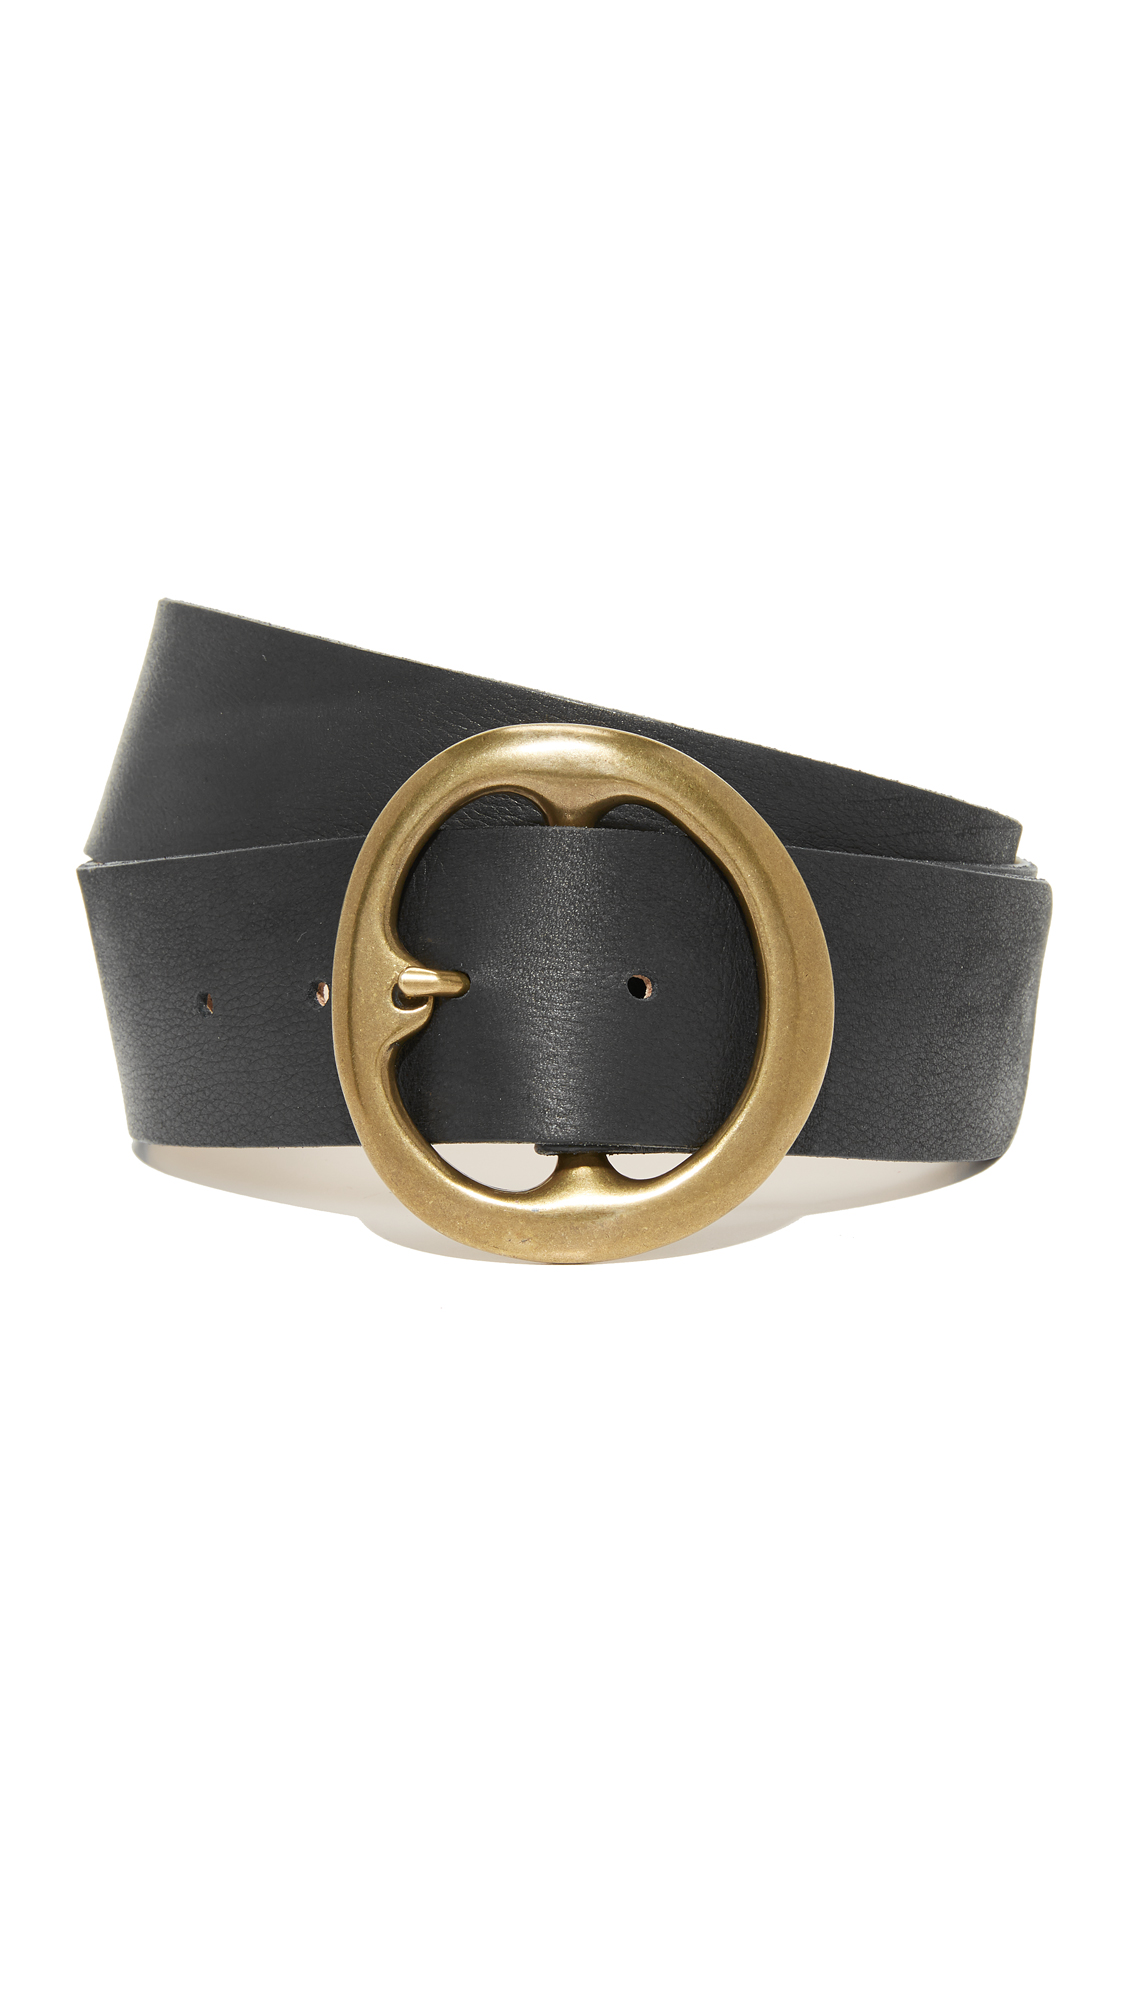 B-Low The Belt Bell Bottom Belt - Black/Brass